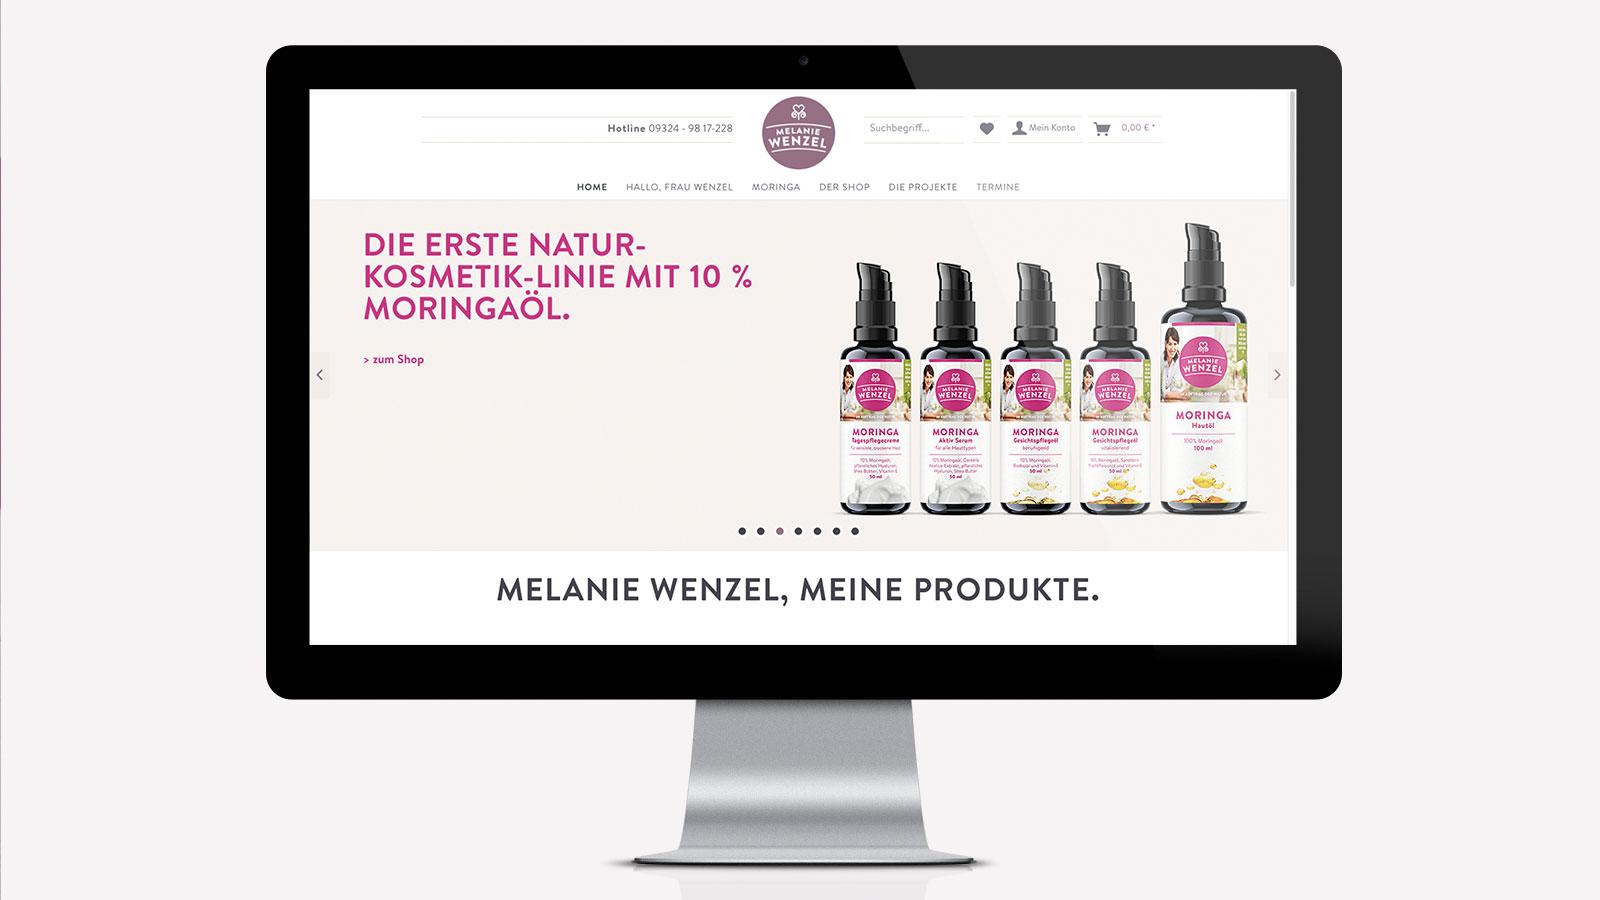 Shop-Design für Moringa-Produkte